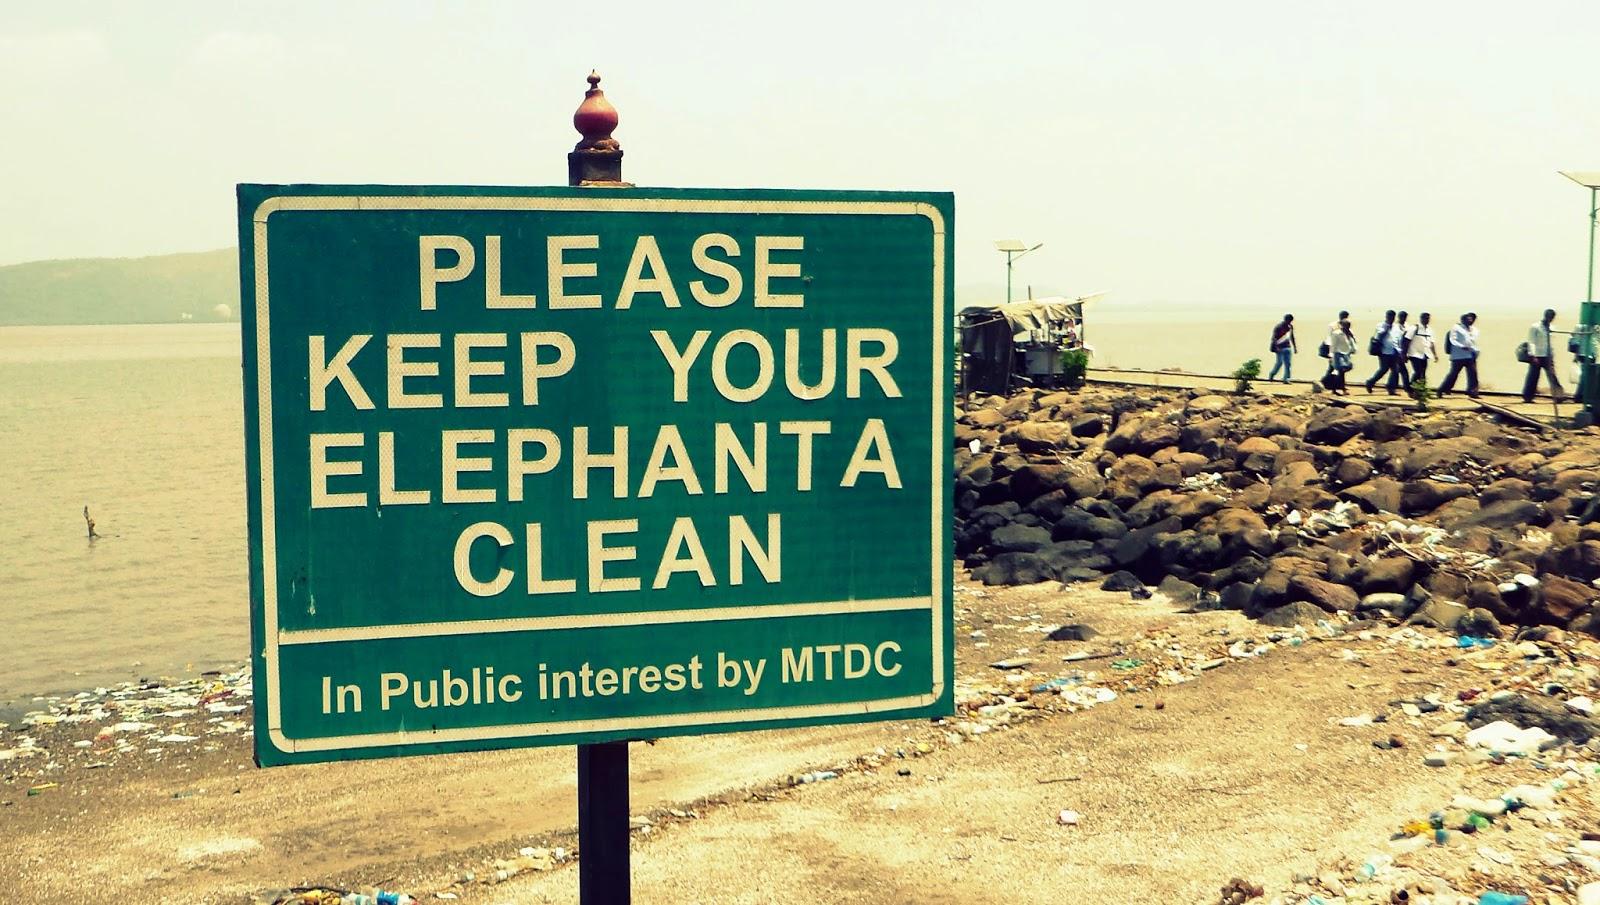 Elephanta sign